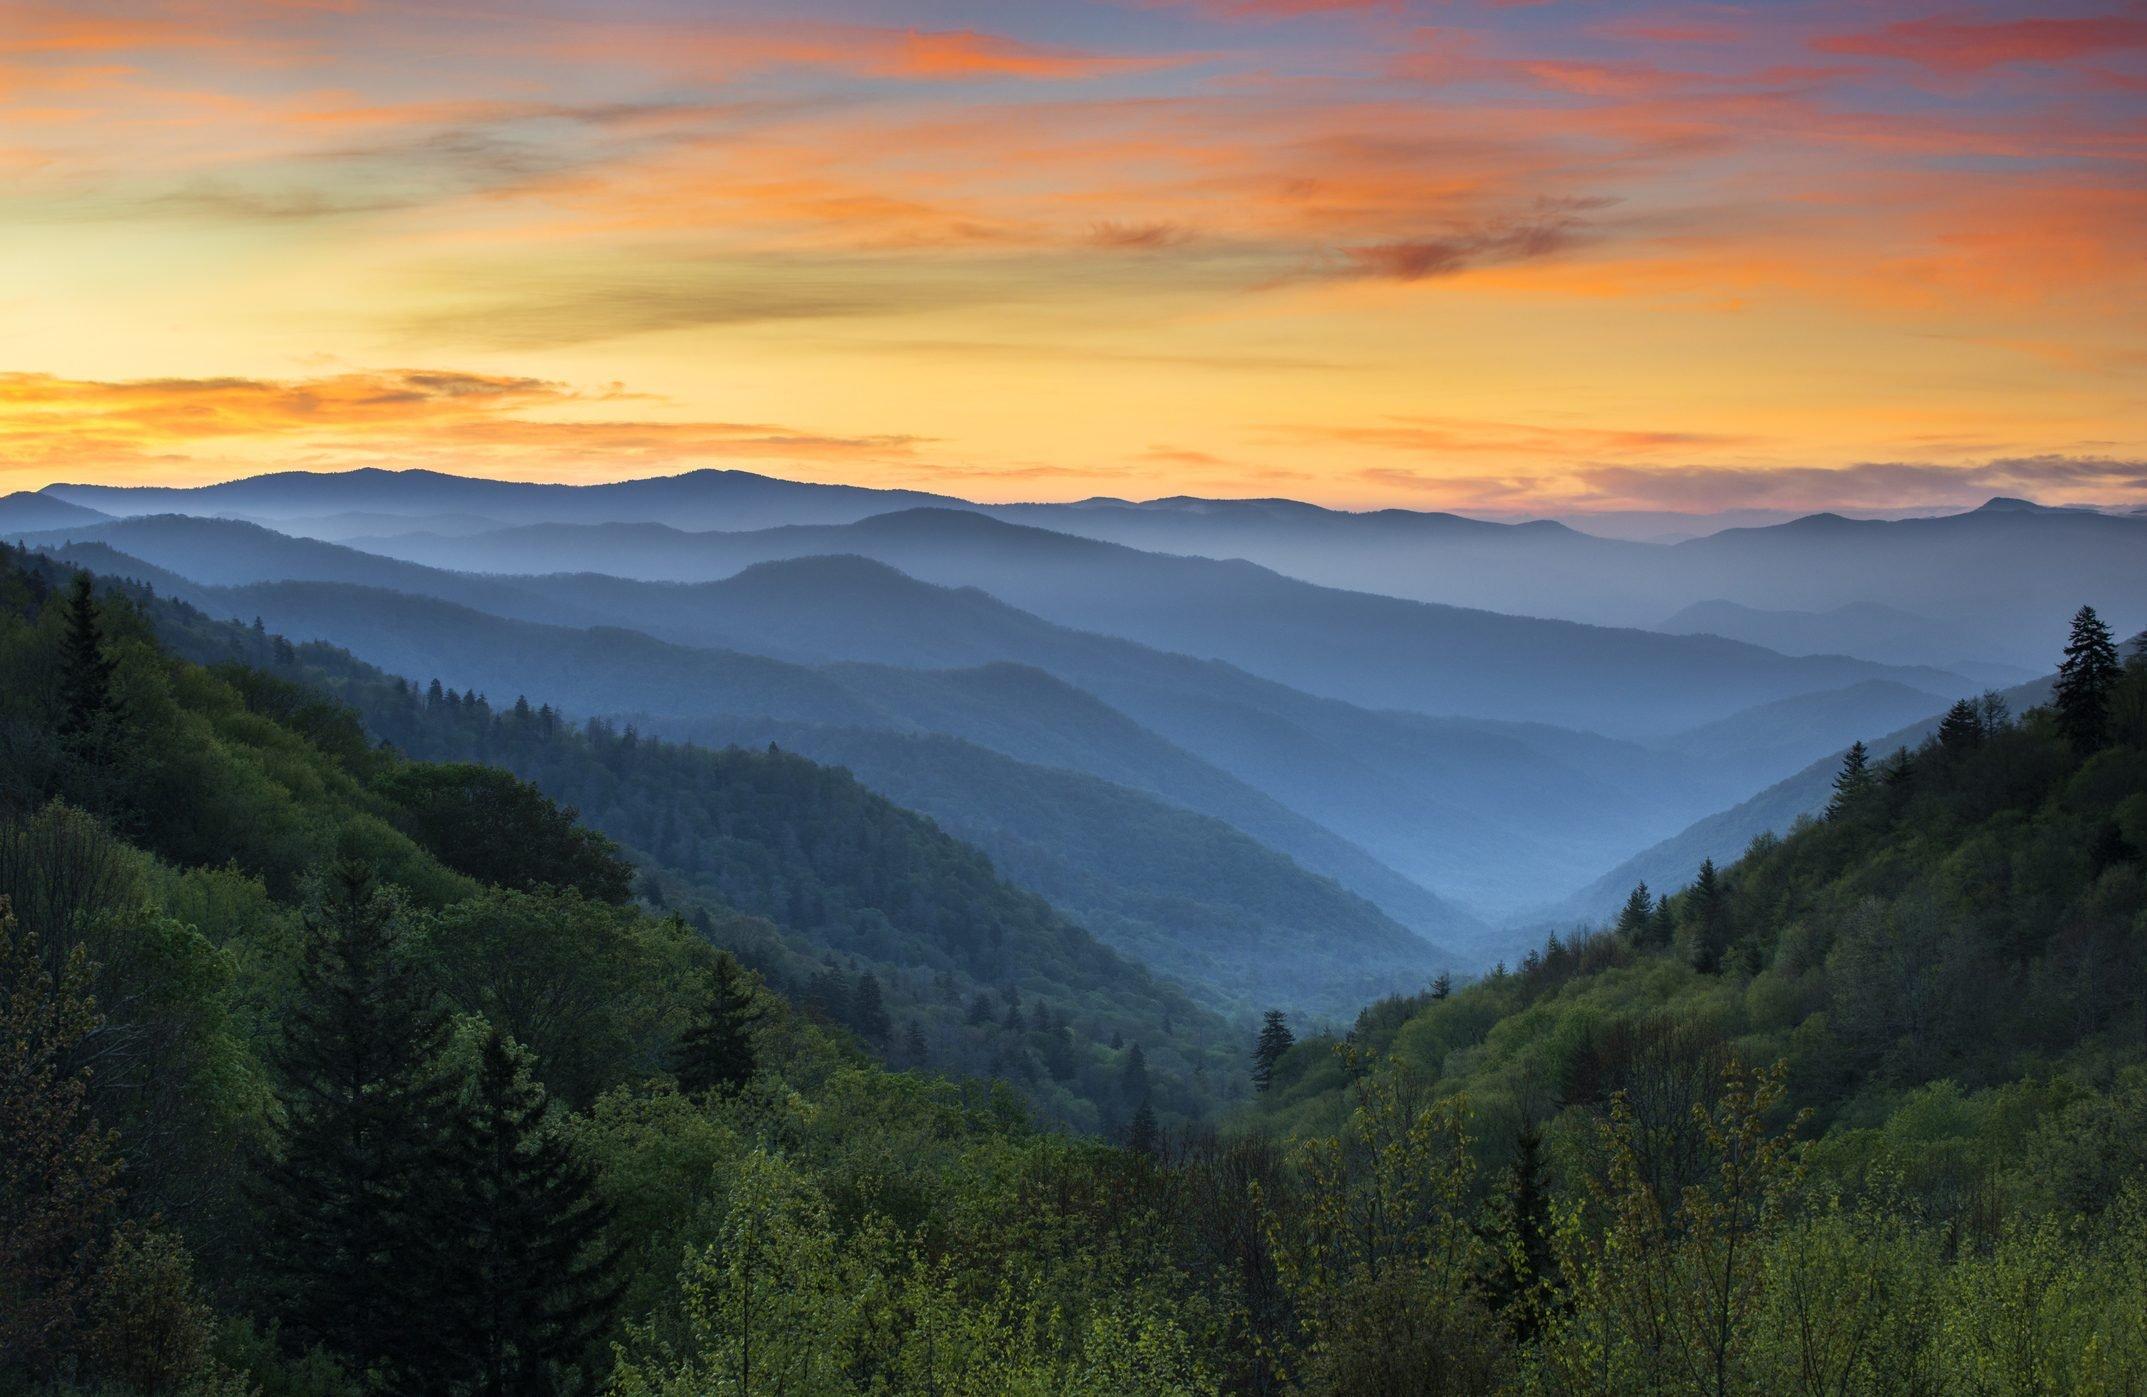 Sunrise Landscape Great Smoky Mountains National Park Gatlinburg TN